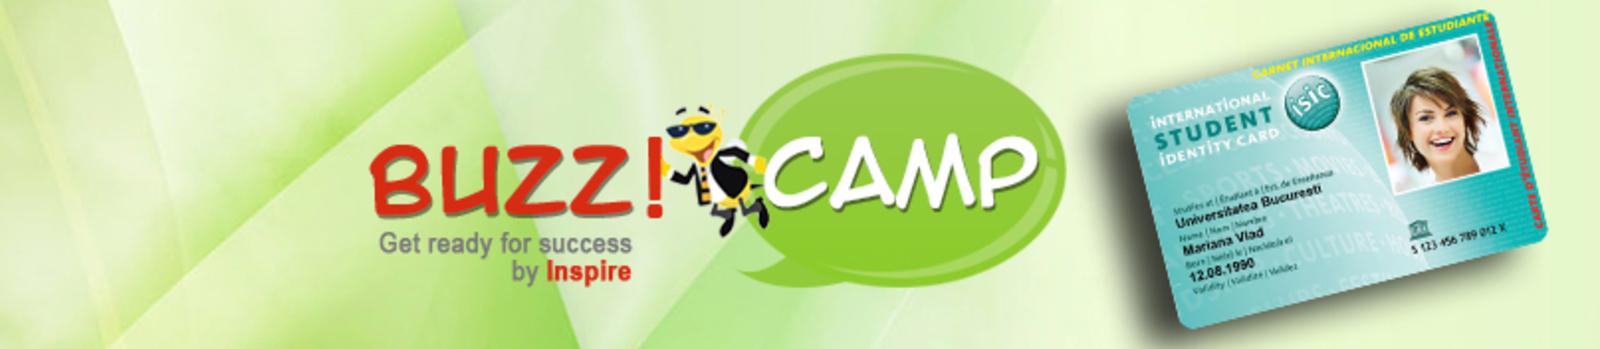 buzz site